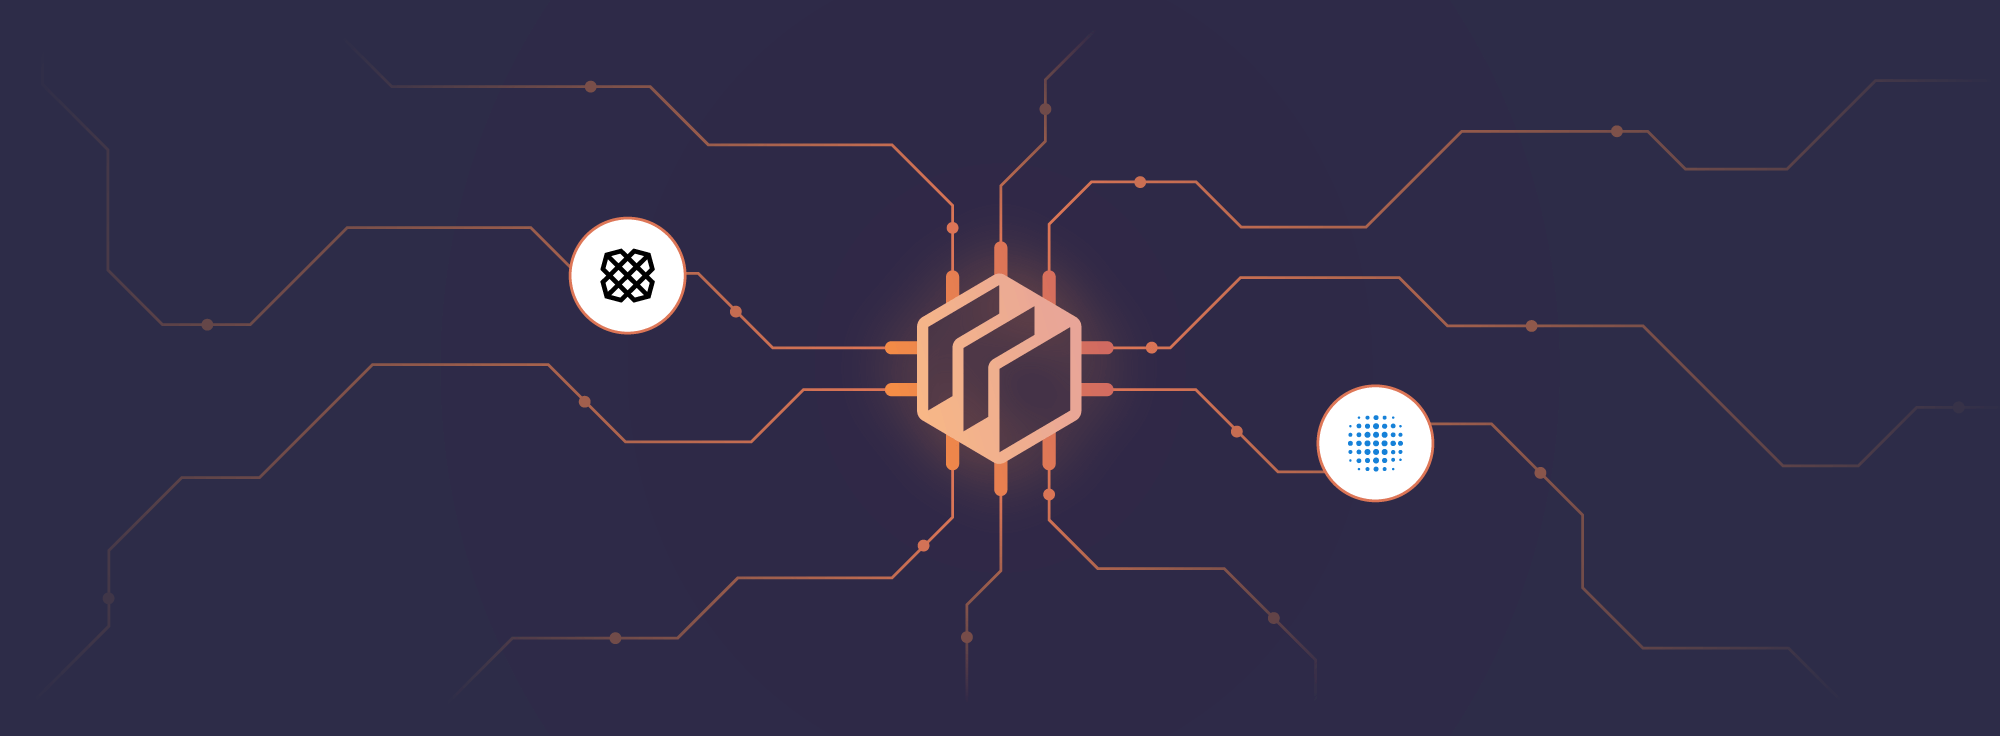 Partnership Graphic